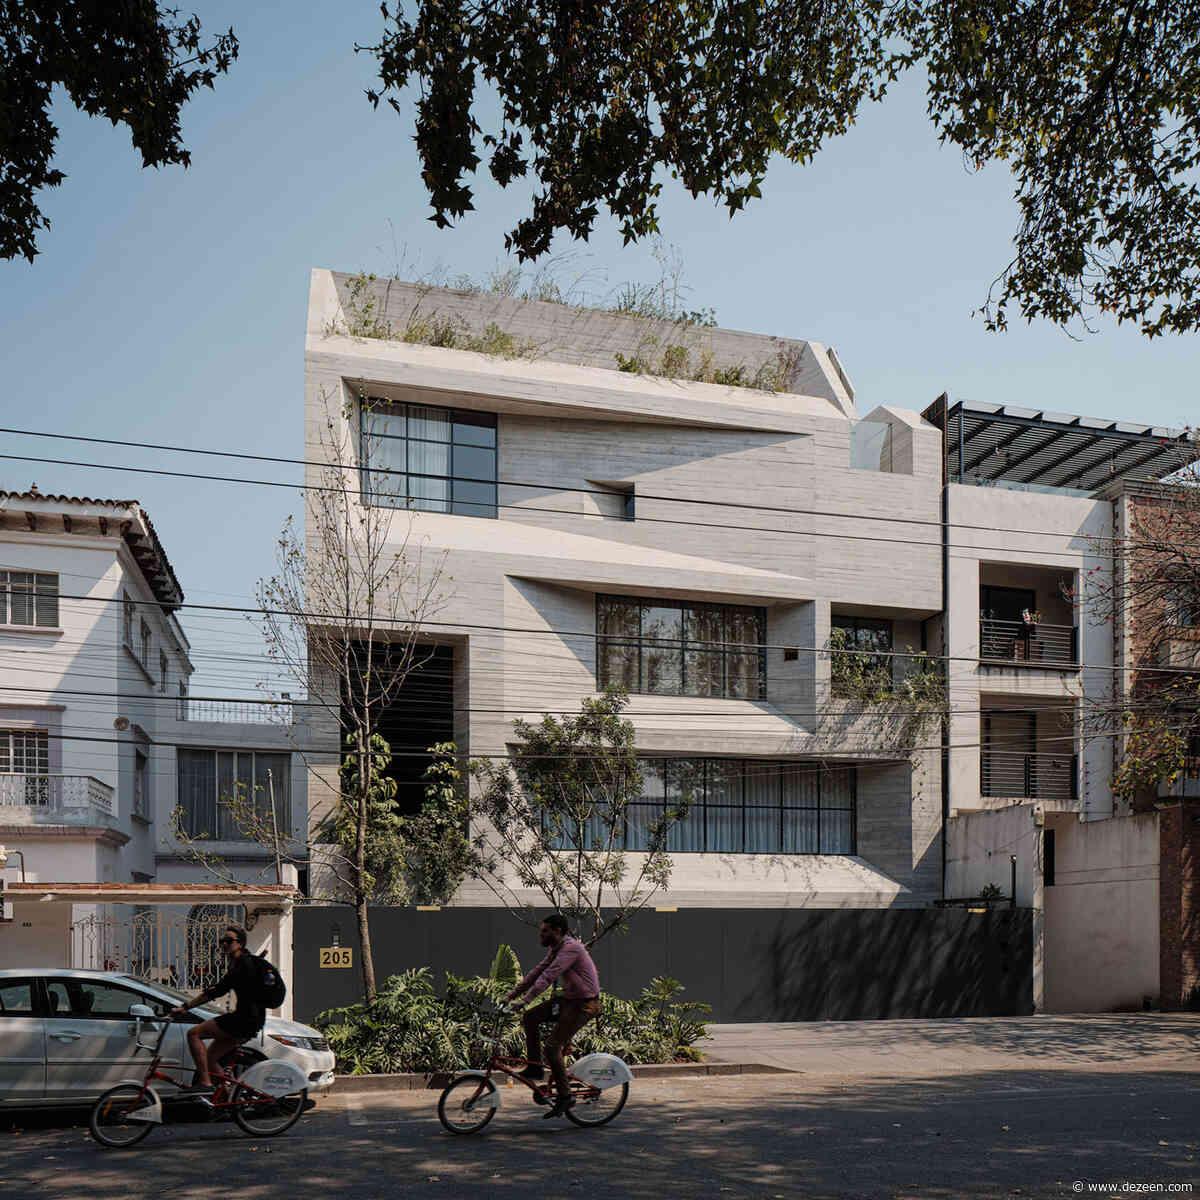 Studio Rick Joy designs concrete apartment complex in Mexico City's Polanco neighbourhood